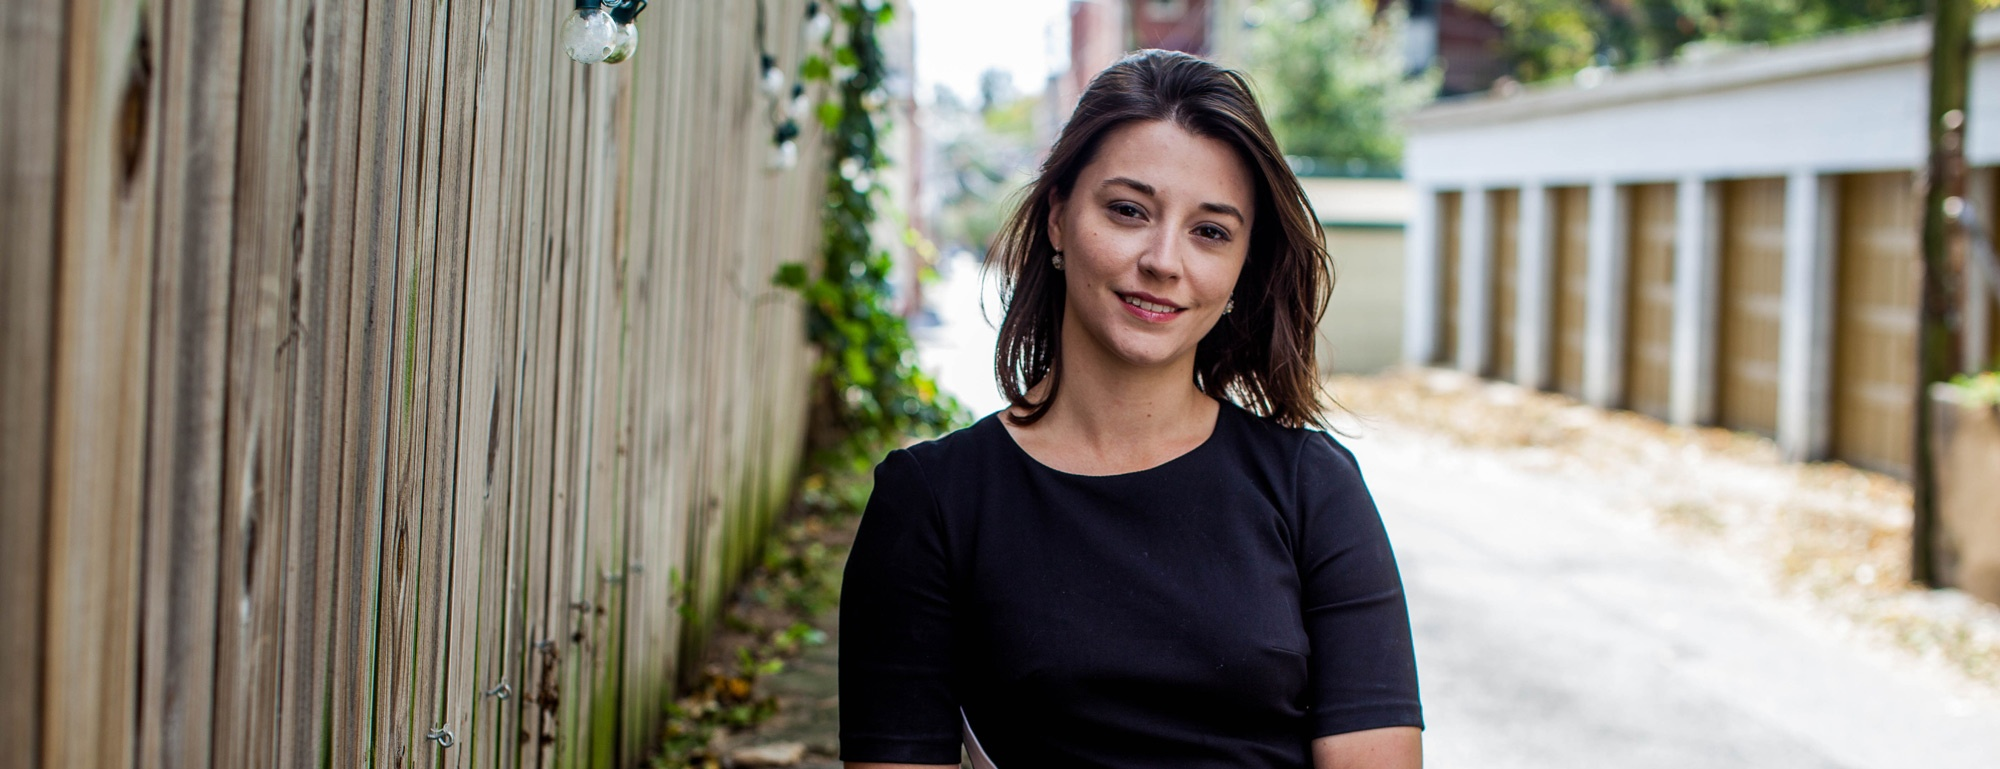 Christina May, CMO and Managing Partner, Illumine8 Marketing and PR